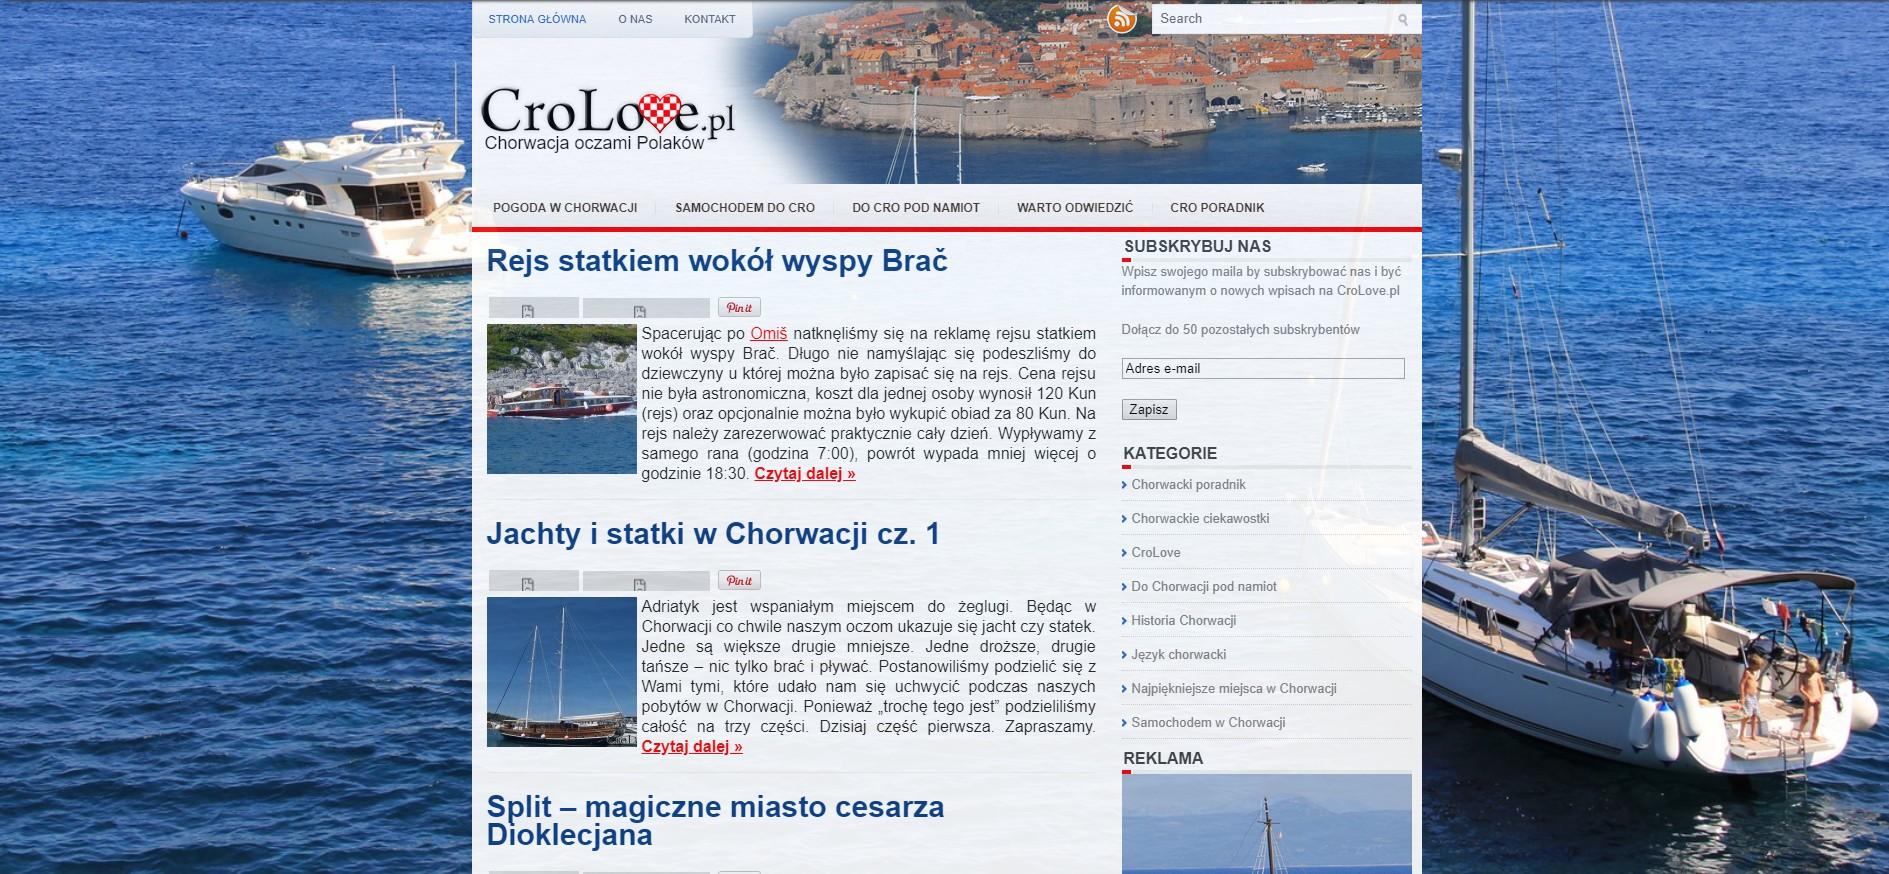 CroLove ver 1.0 (lata 2012-2014)